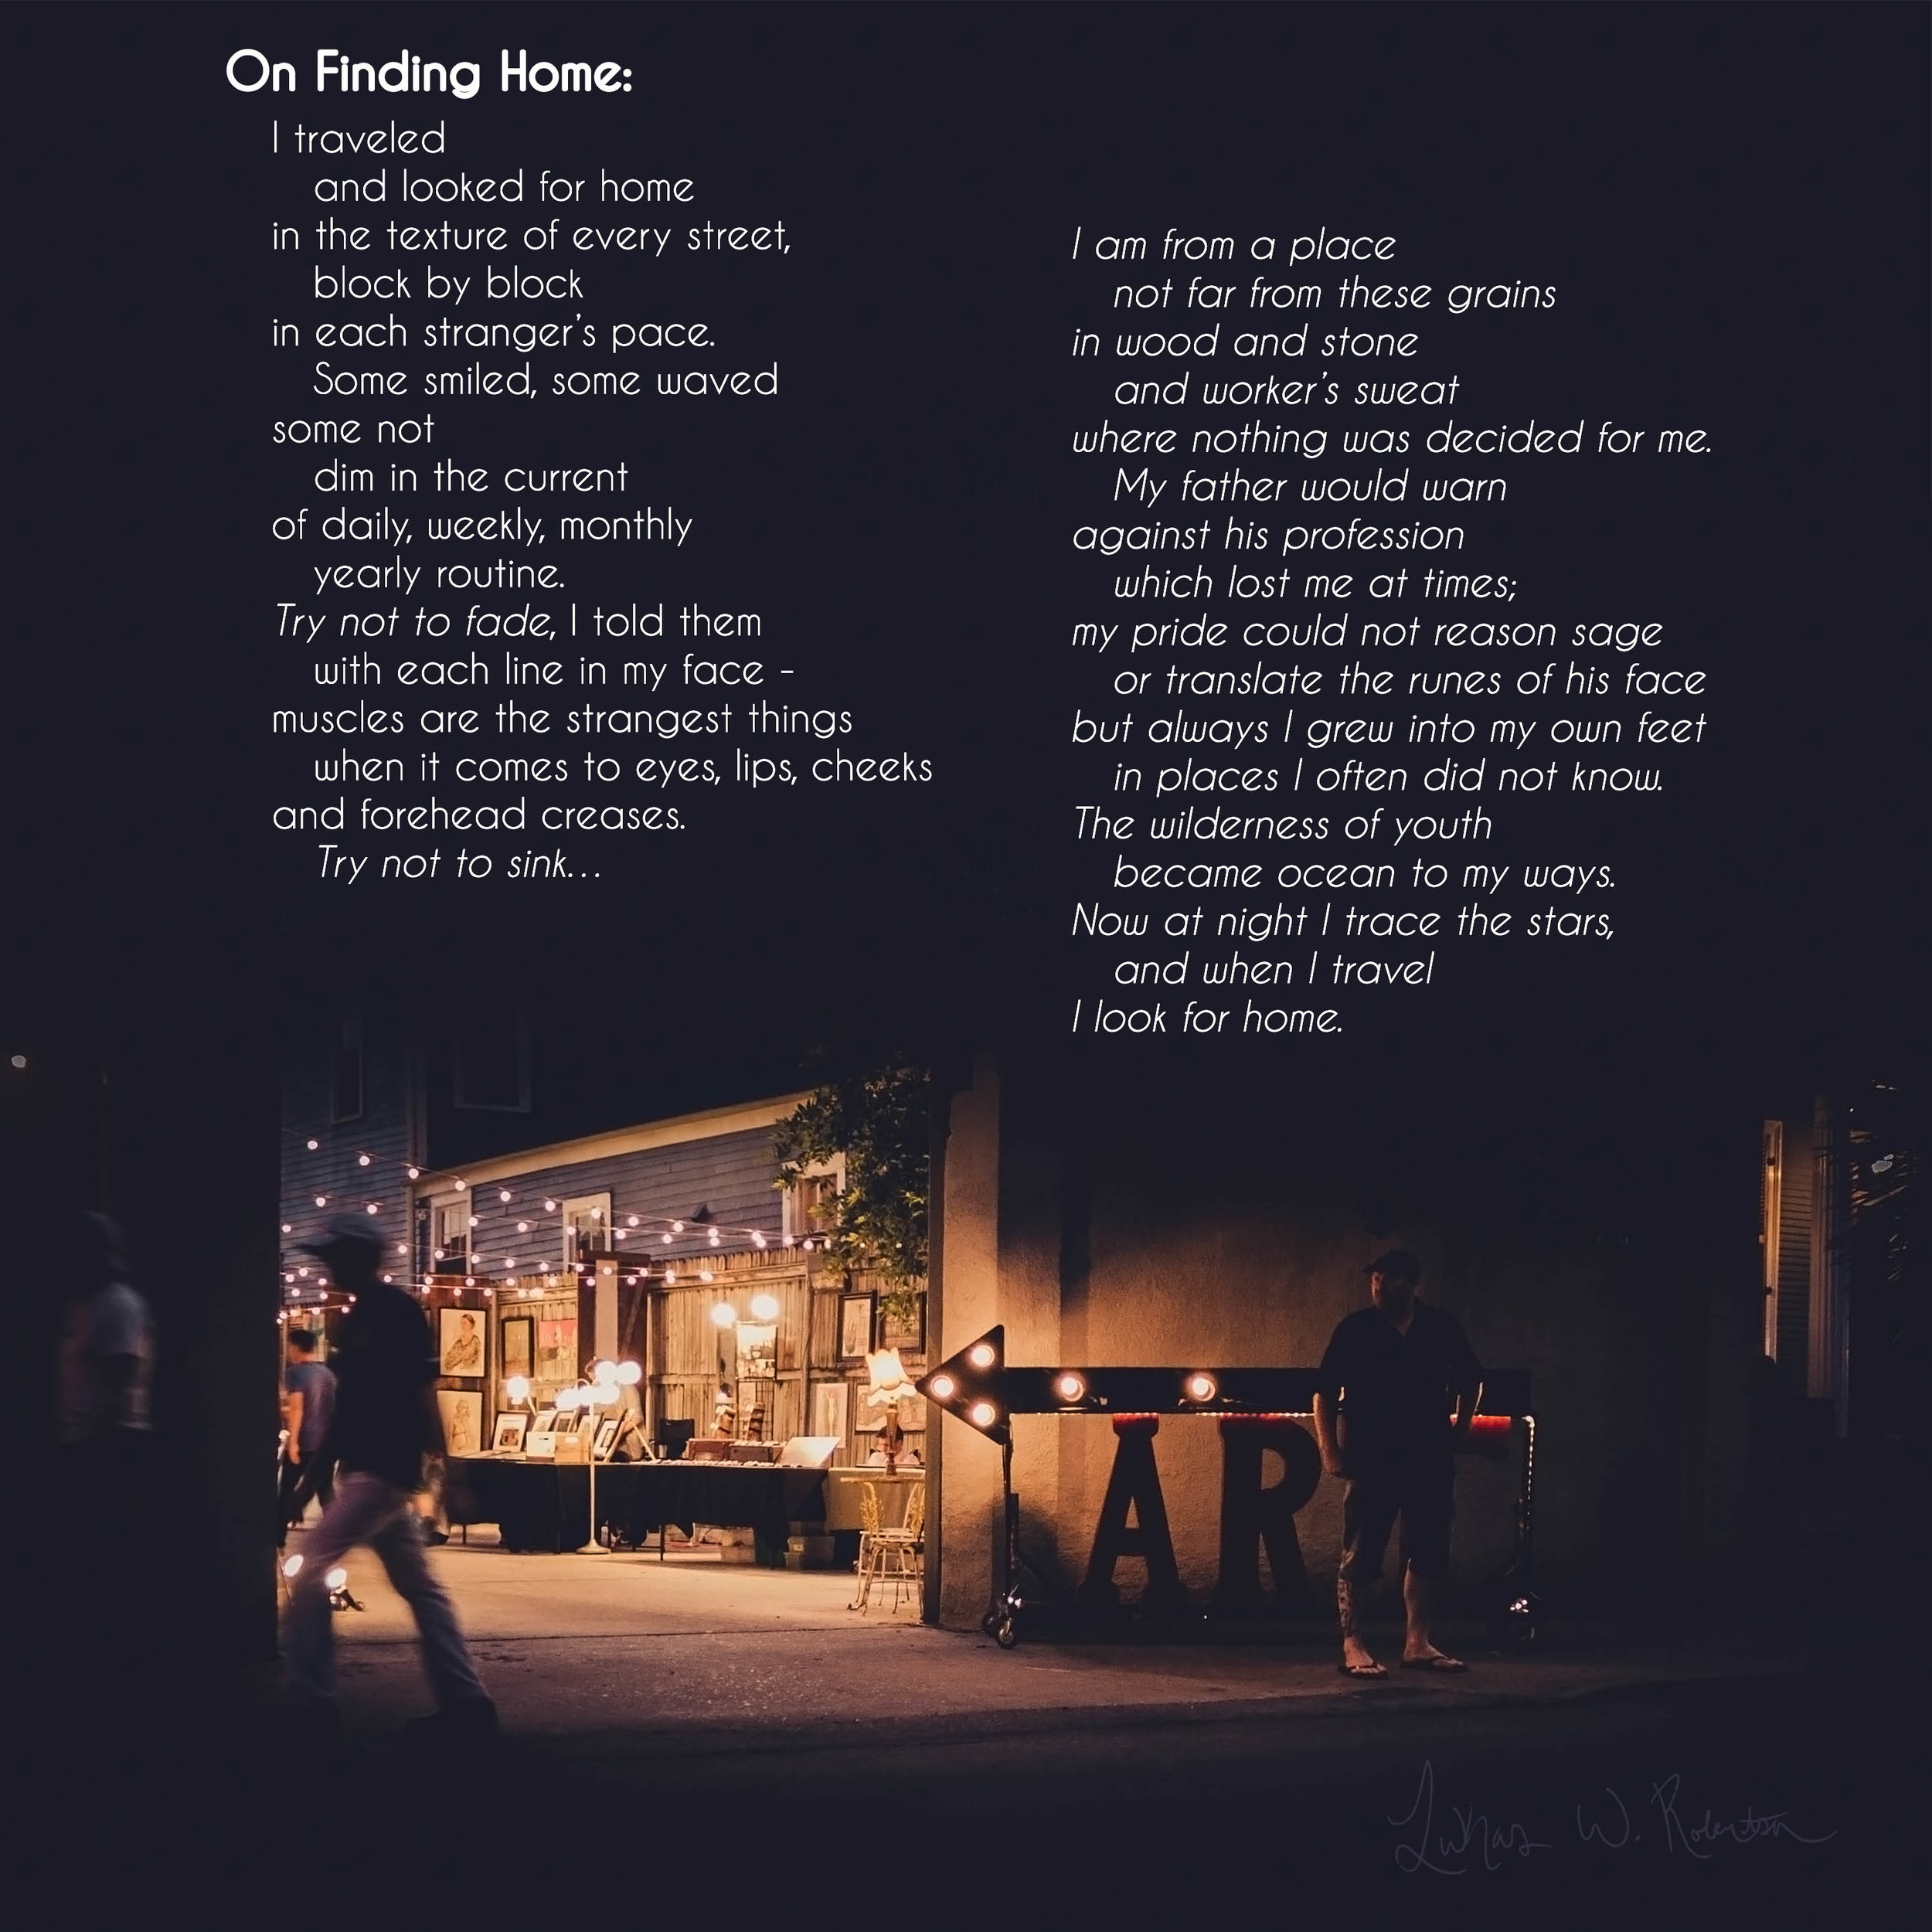 On-Finding-Home-01.jpg